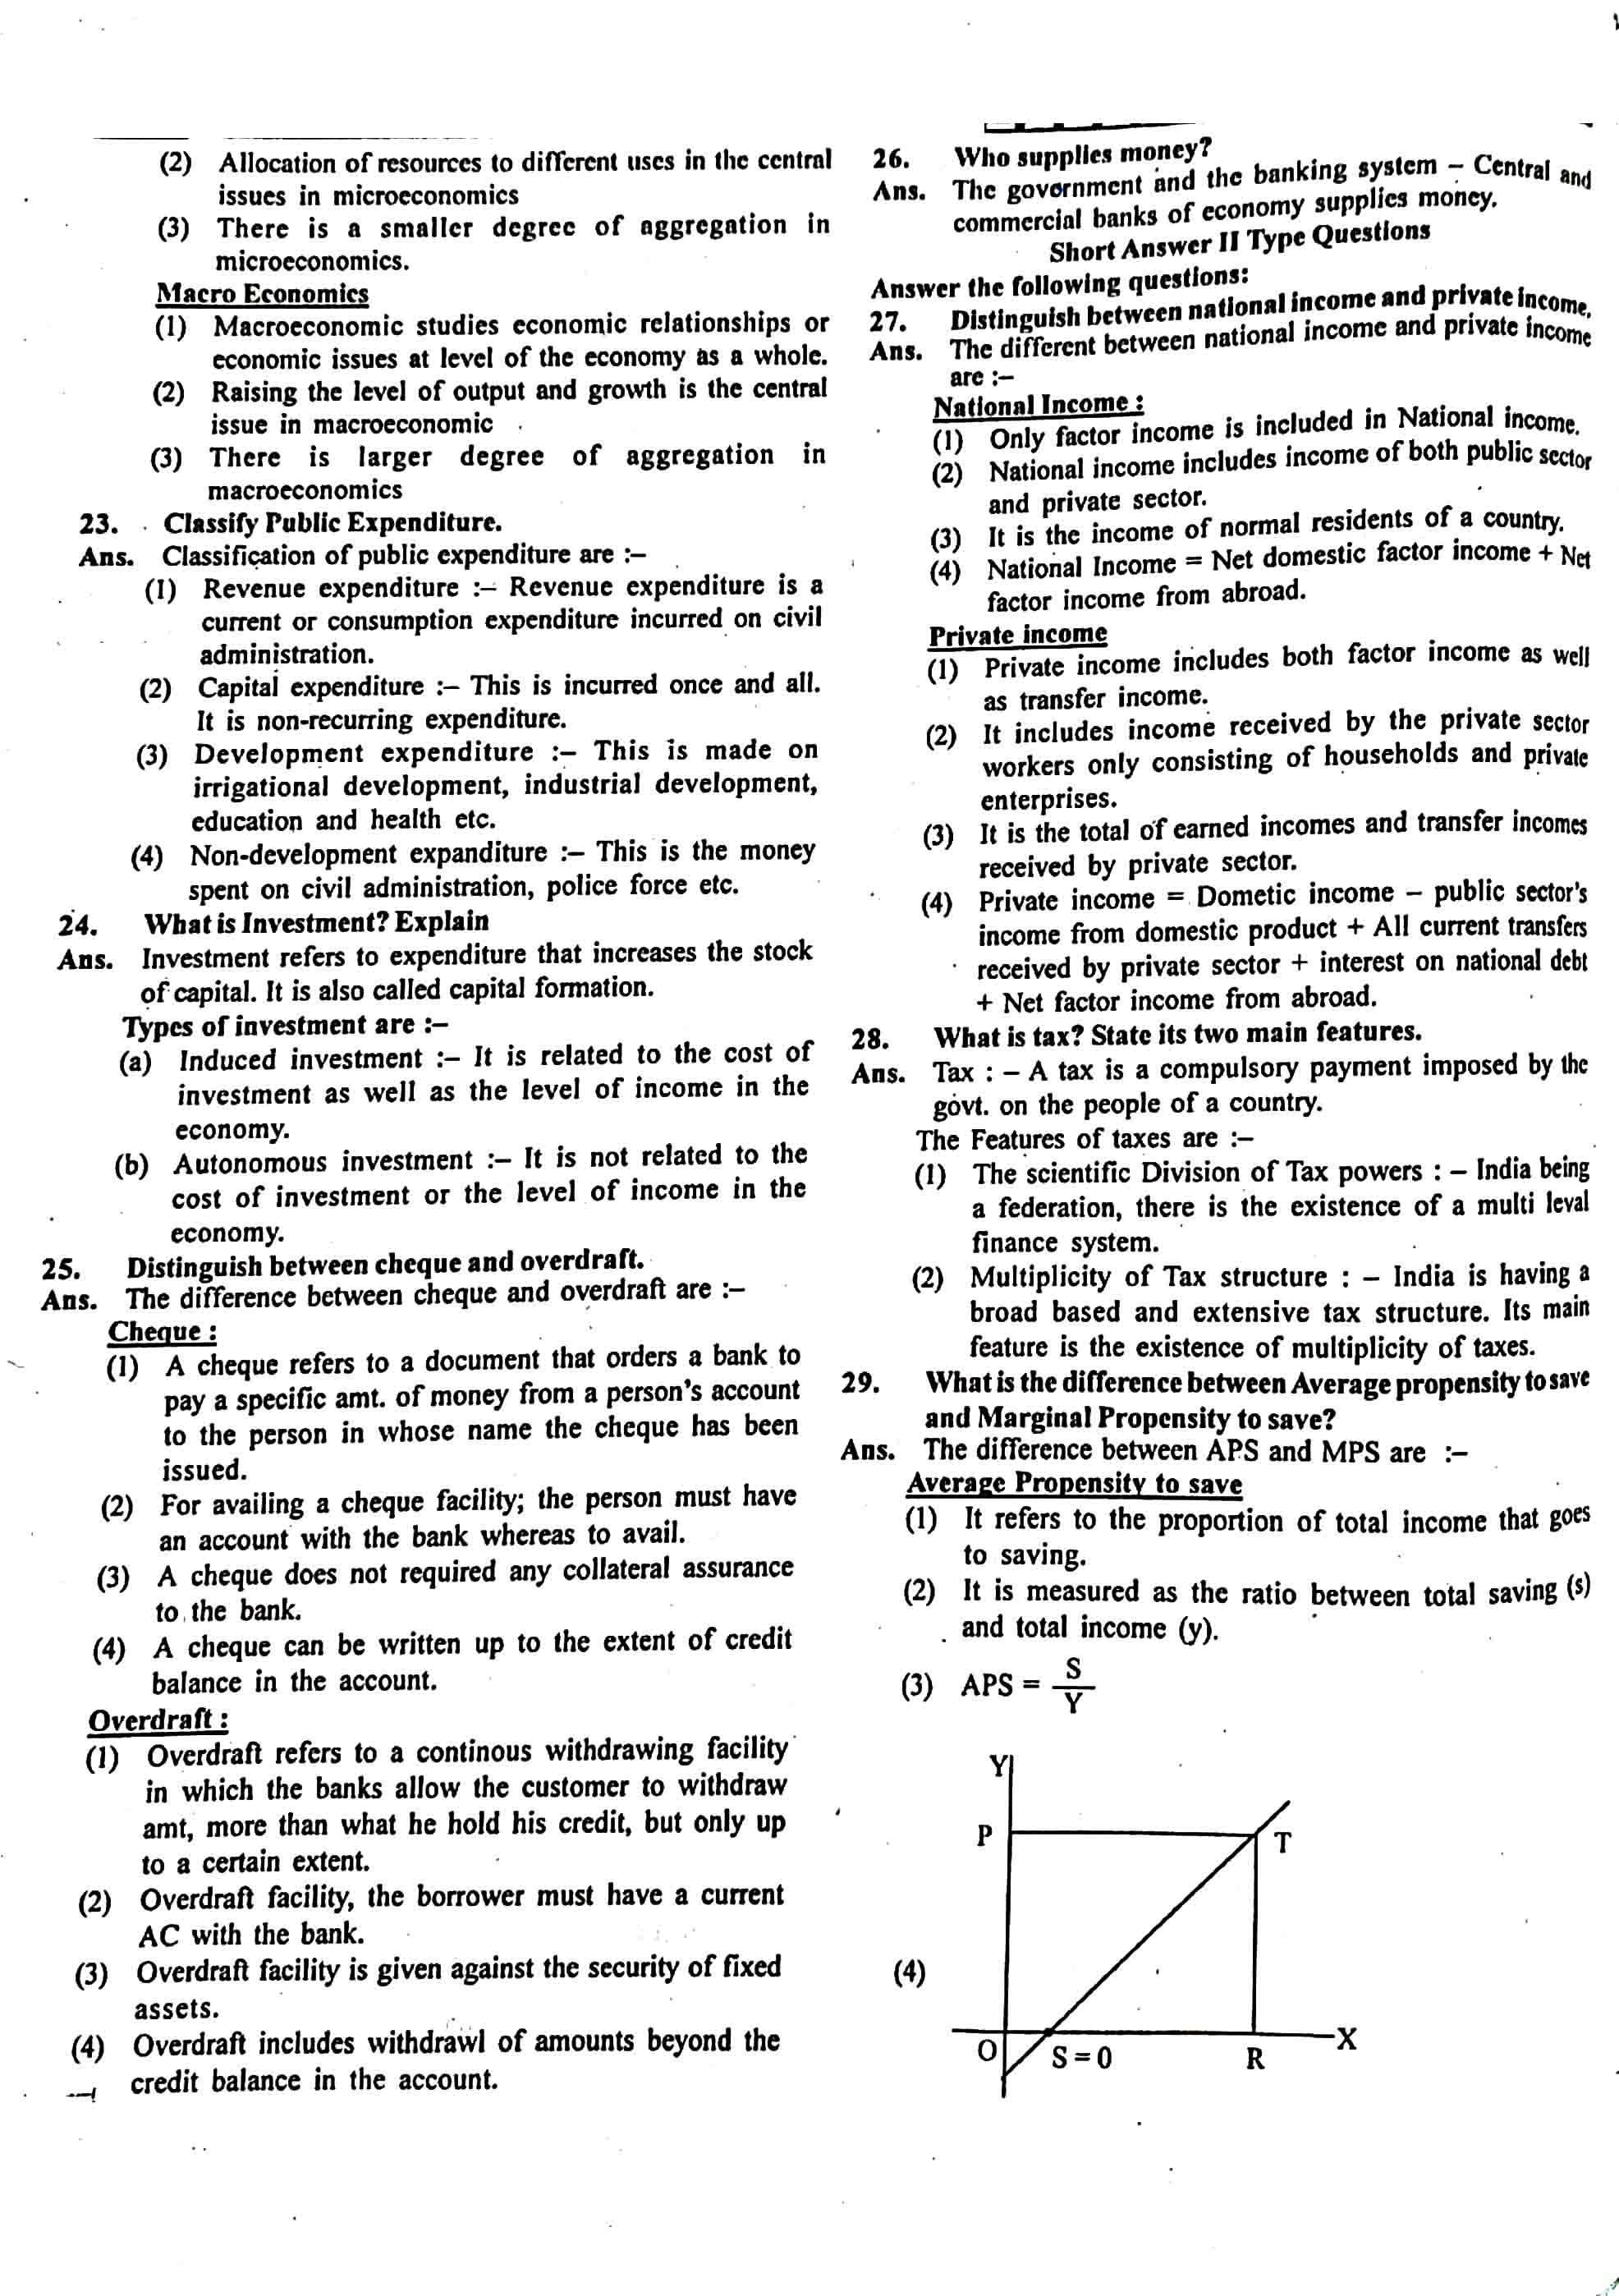 JAC Class 12 economics 2014 Question Paper 03